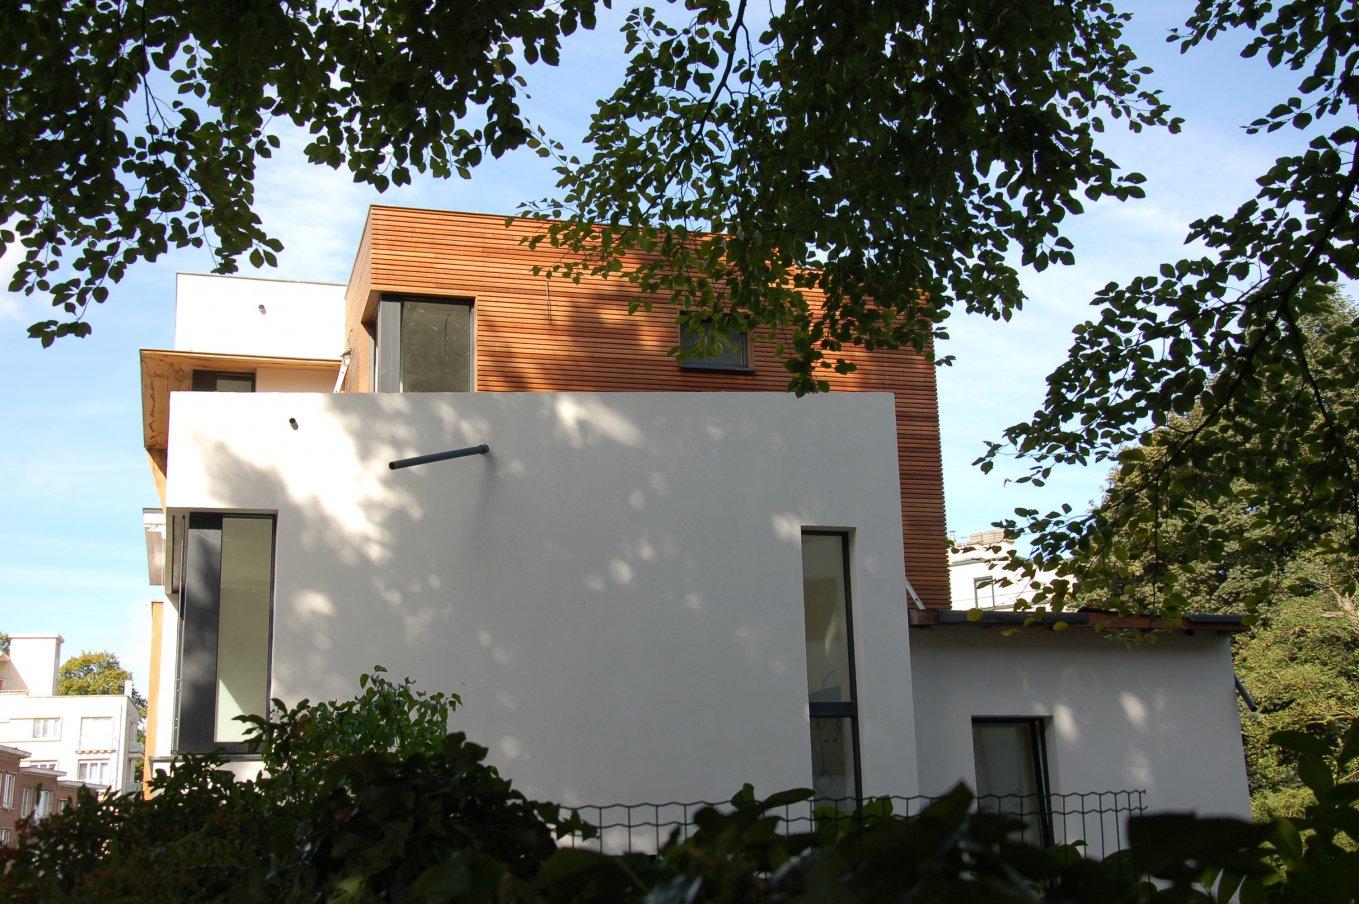 Klipveld_façade